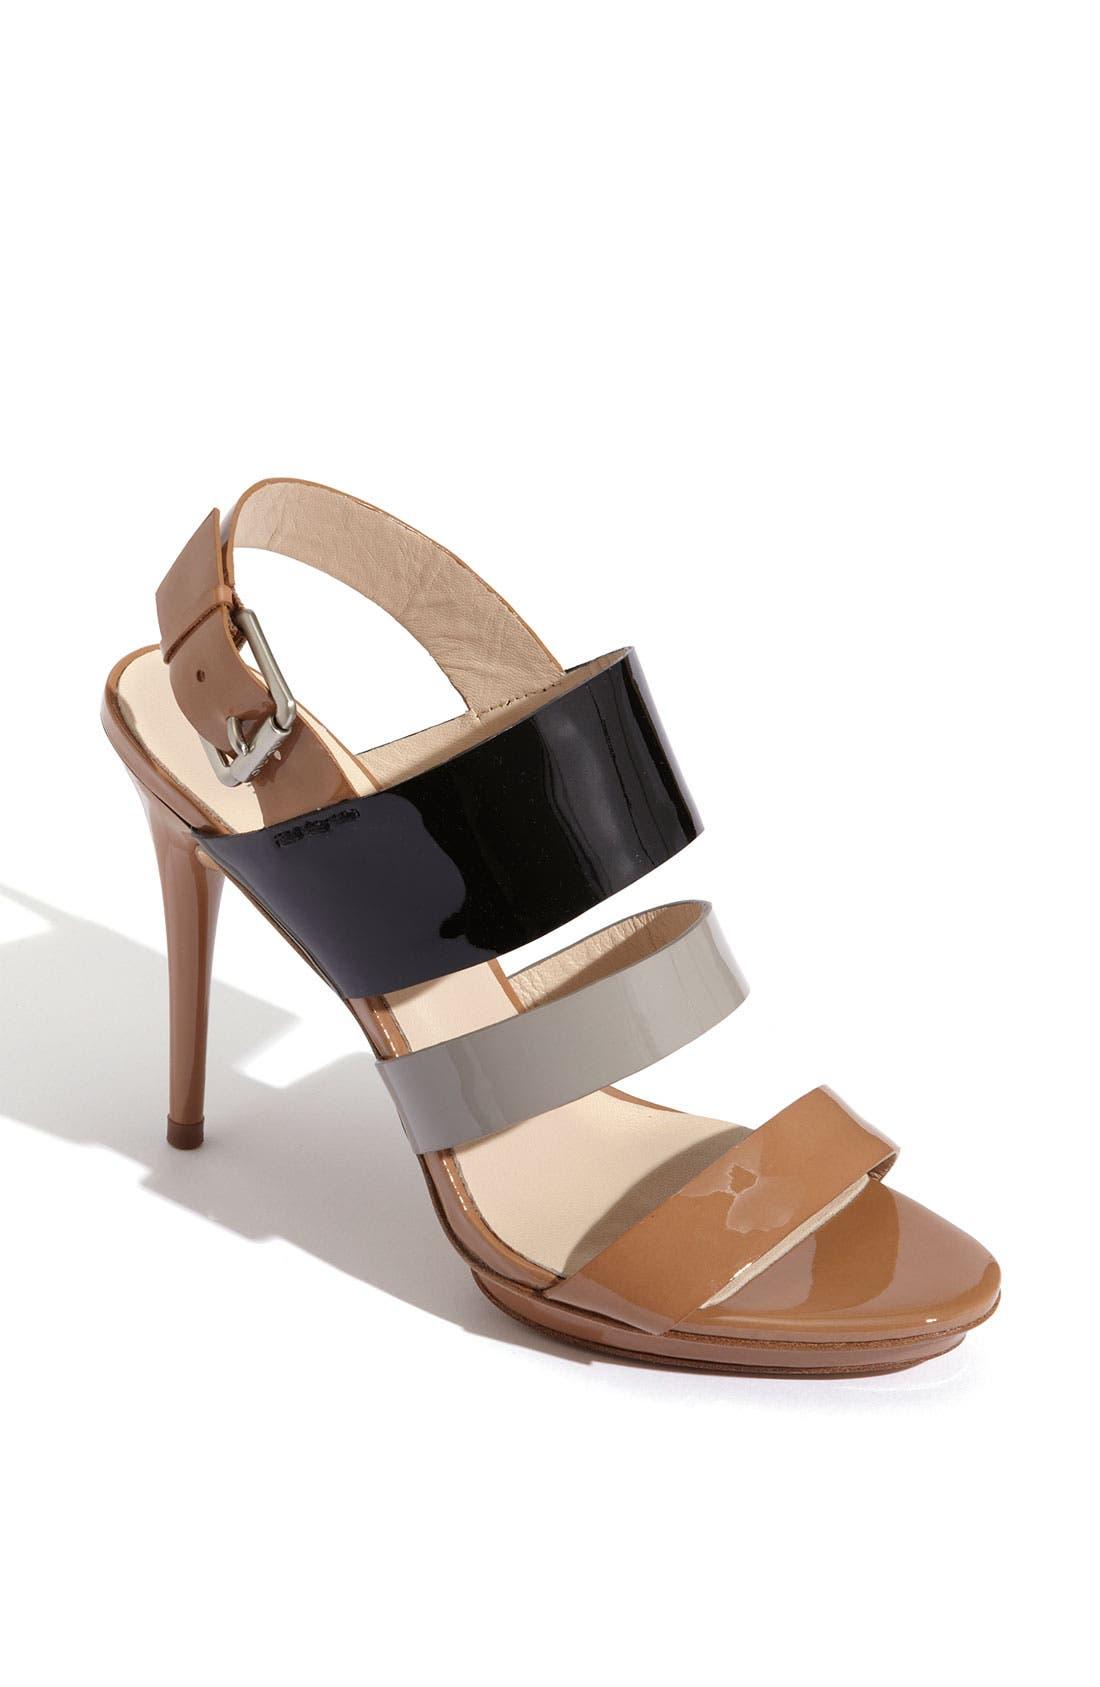 Main Image - KORS Michael Kors 'Lizzie' Sandal